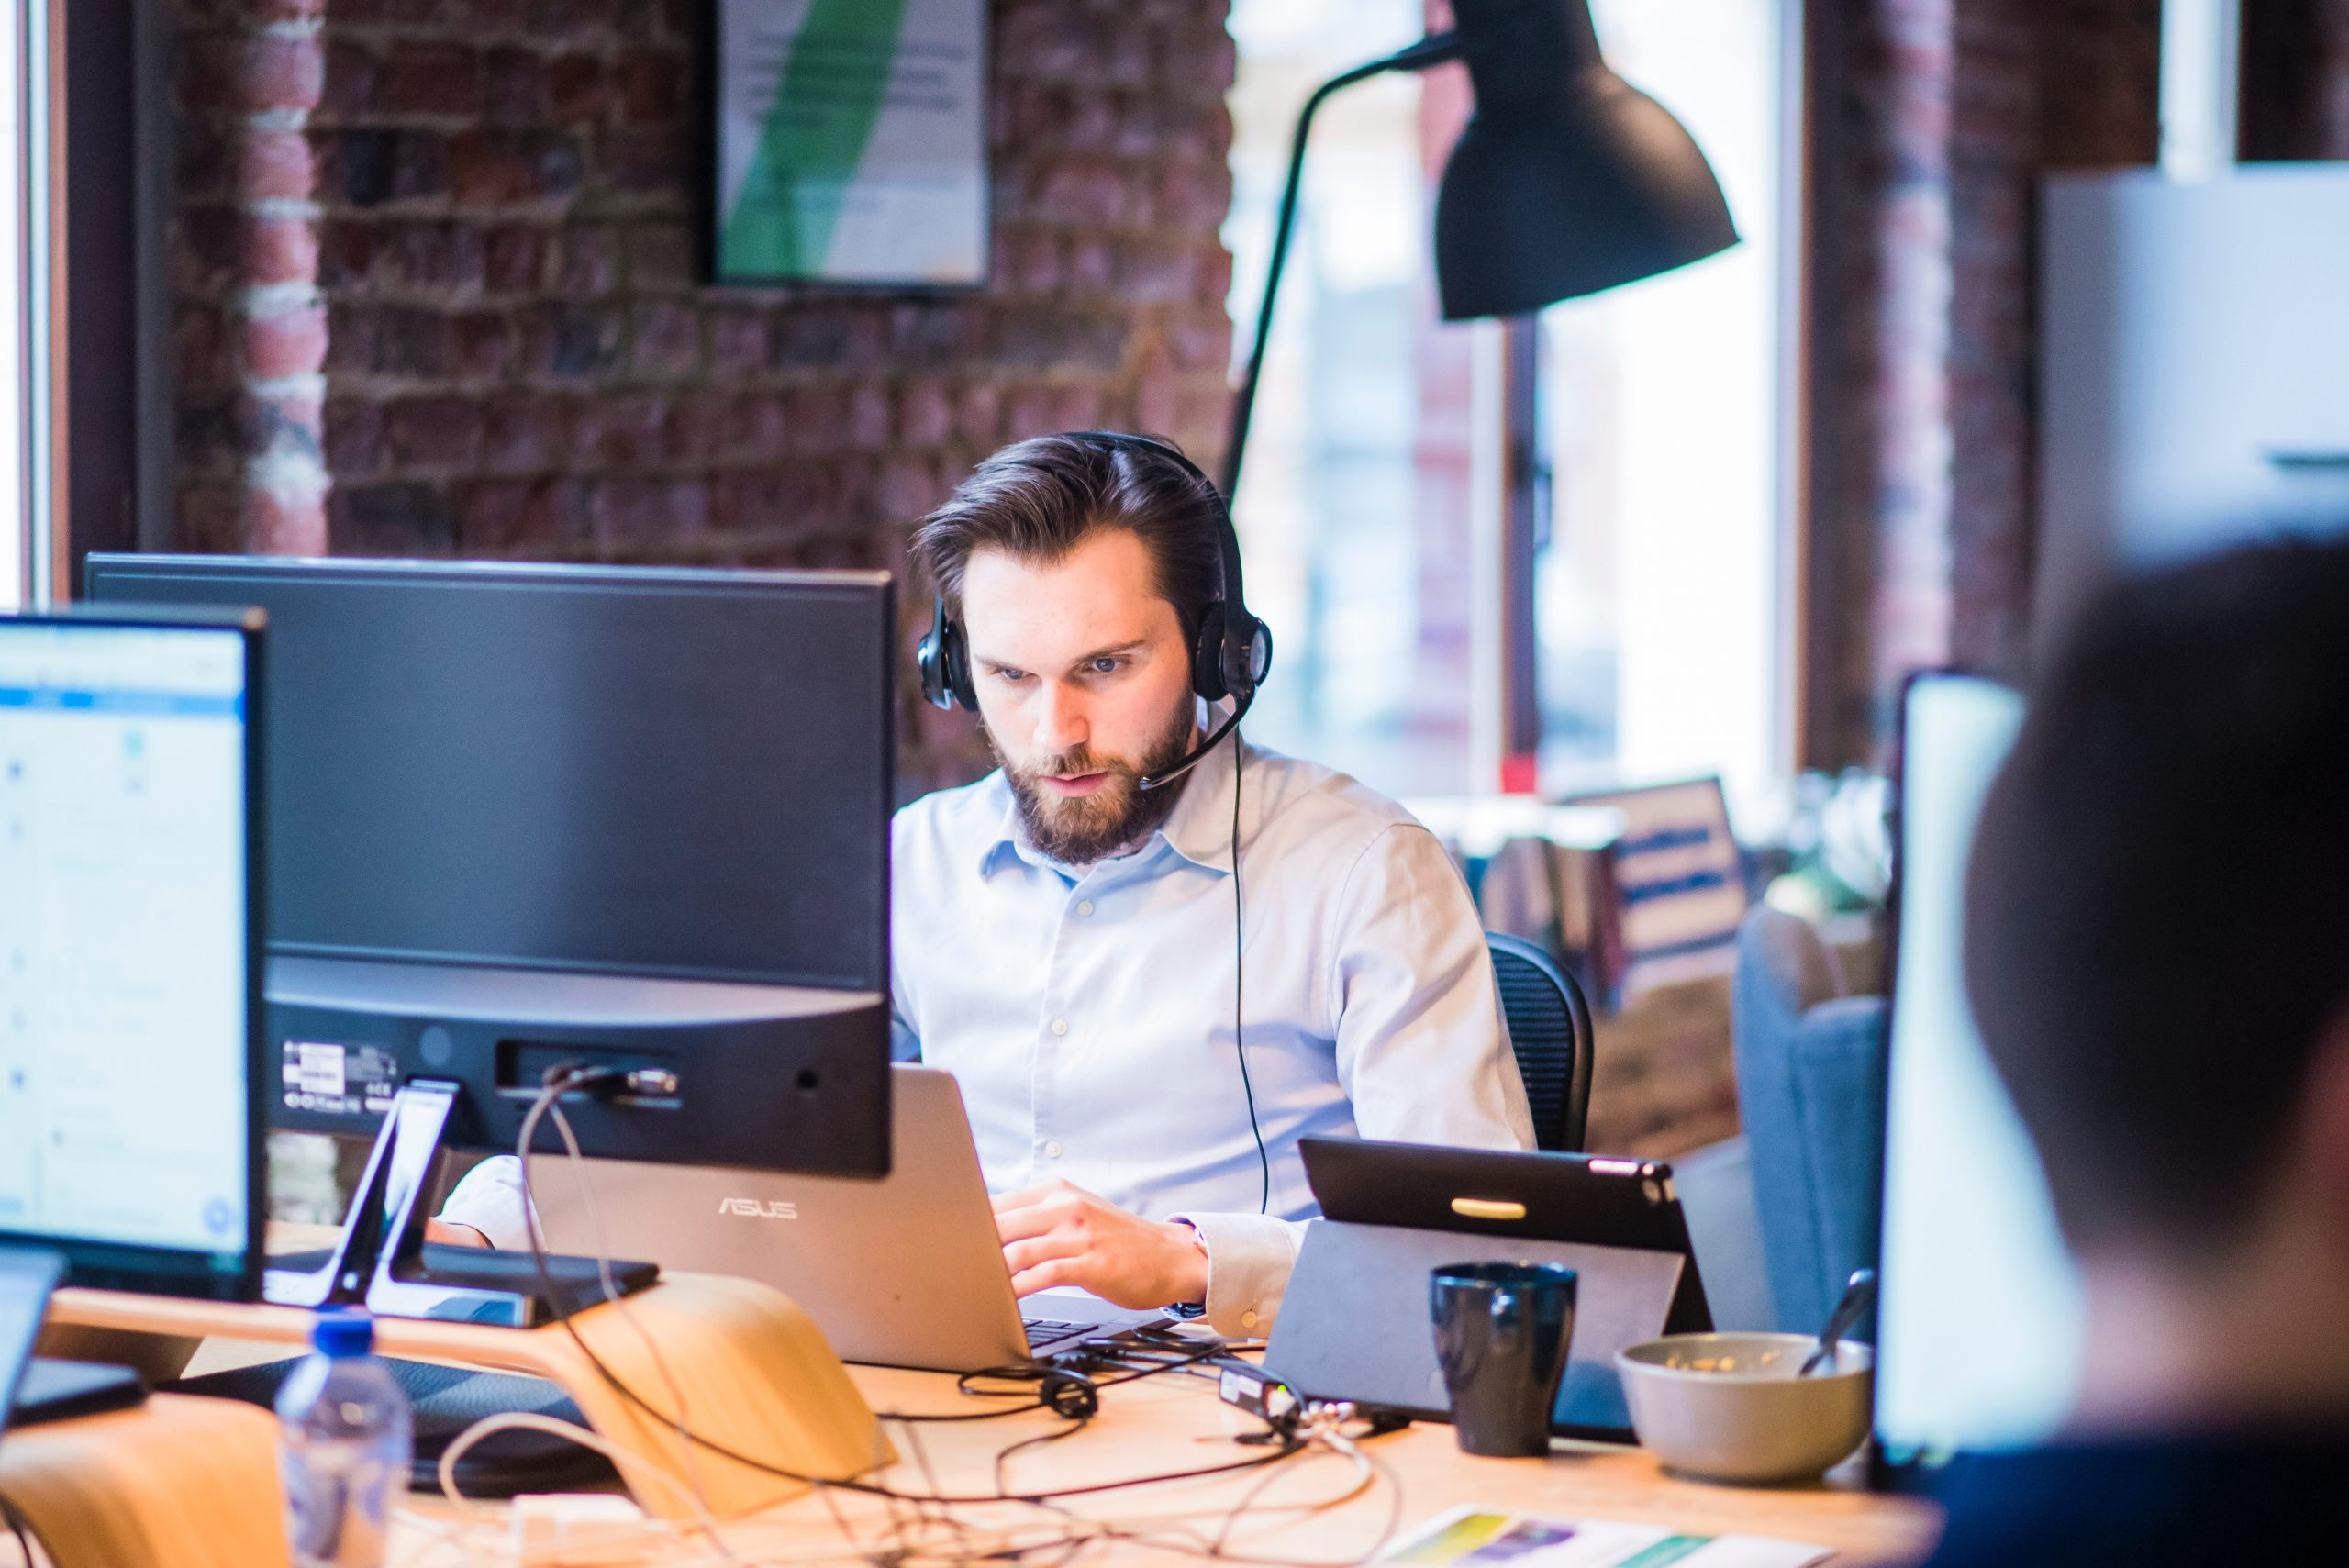 man in shirt looking at laptop